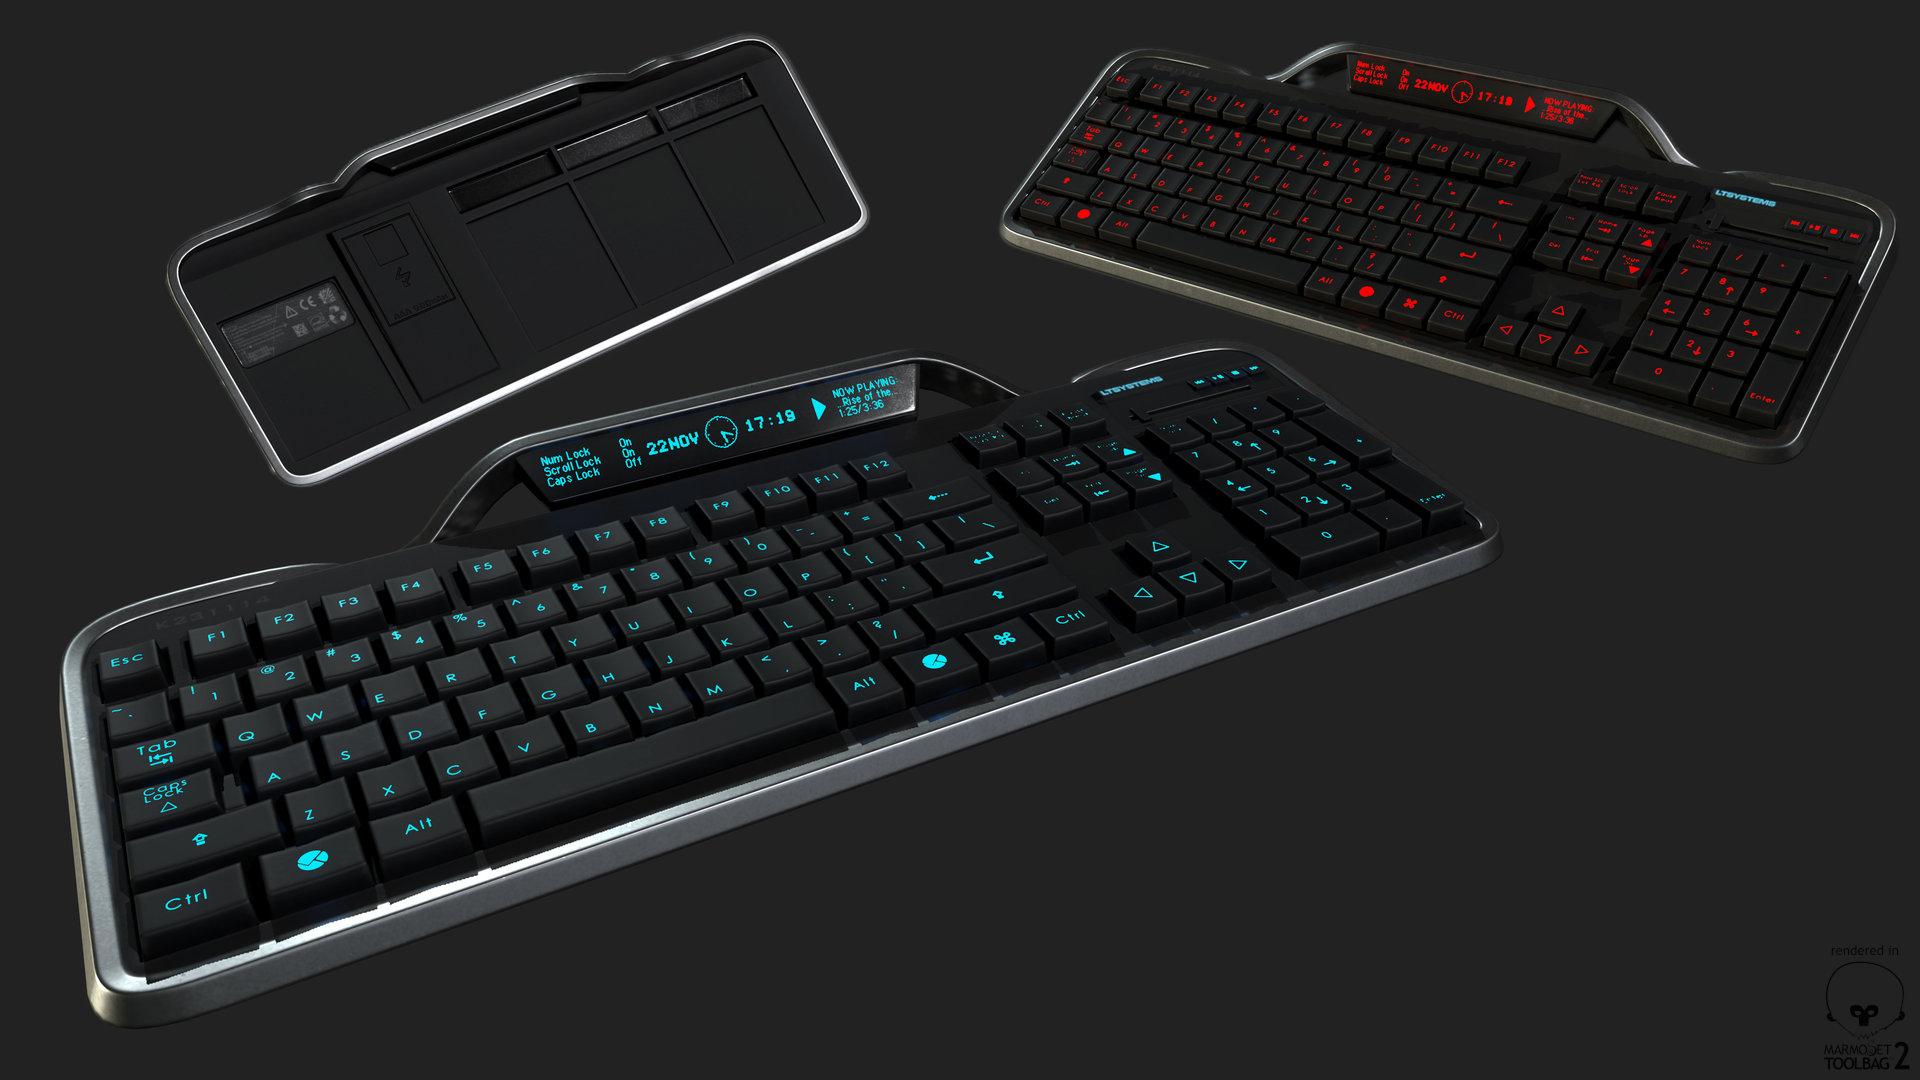 Ben bickle keyboard marmoset2